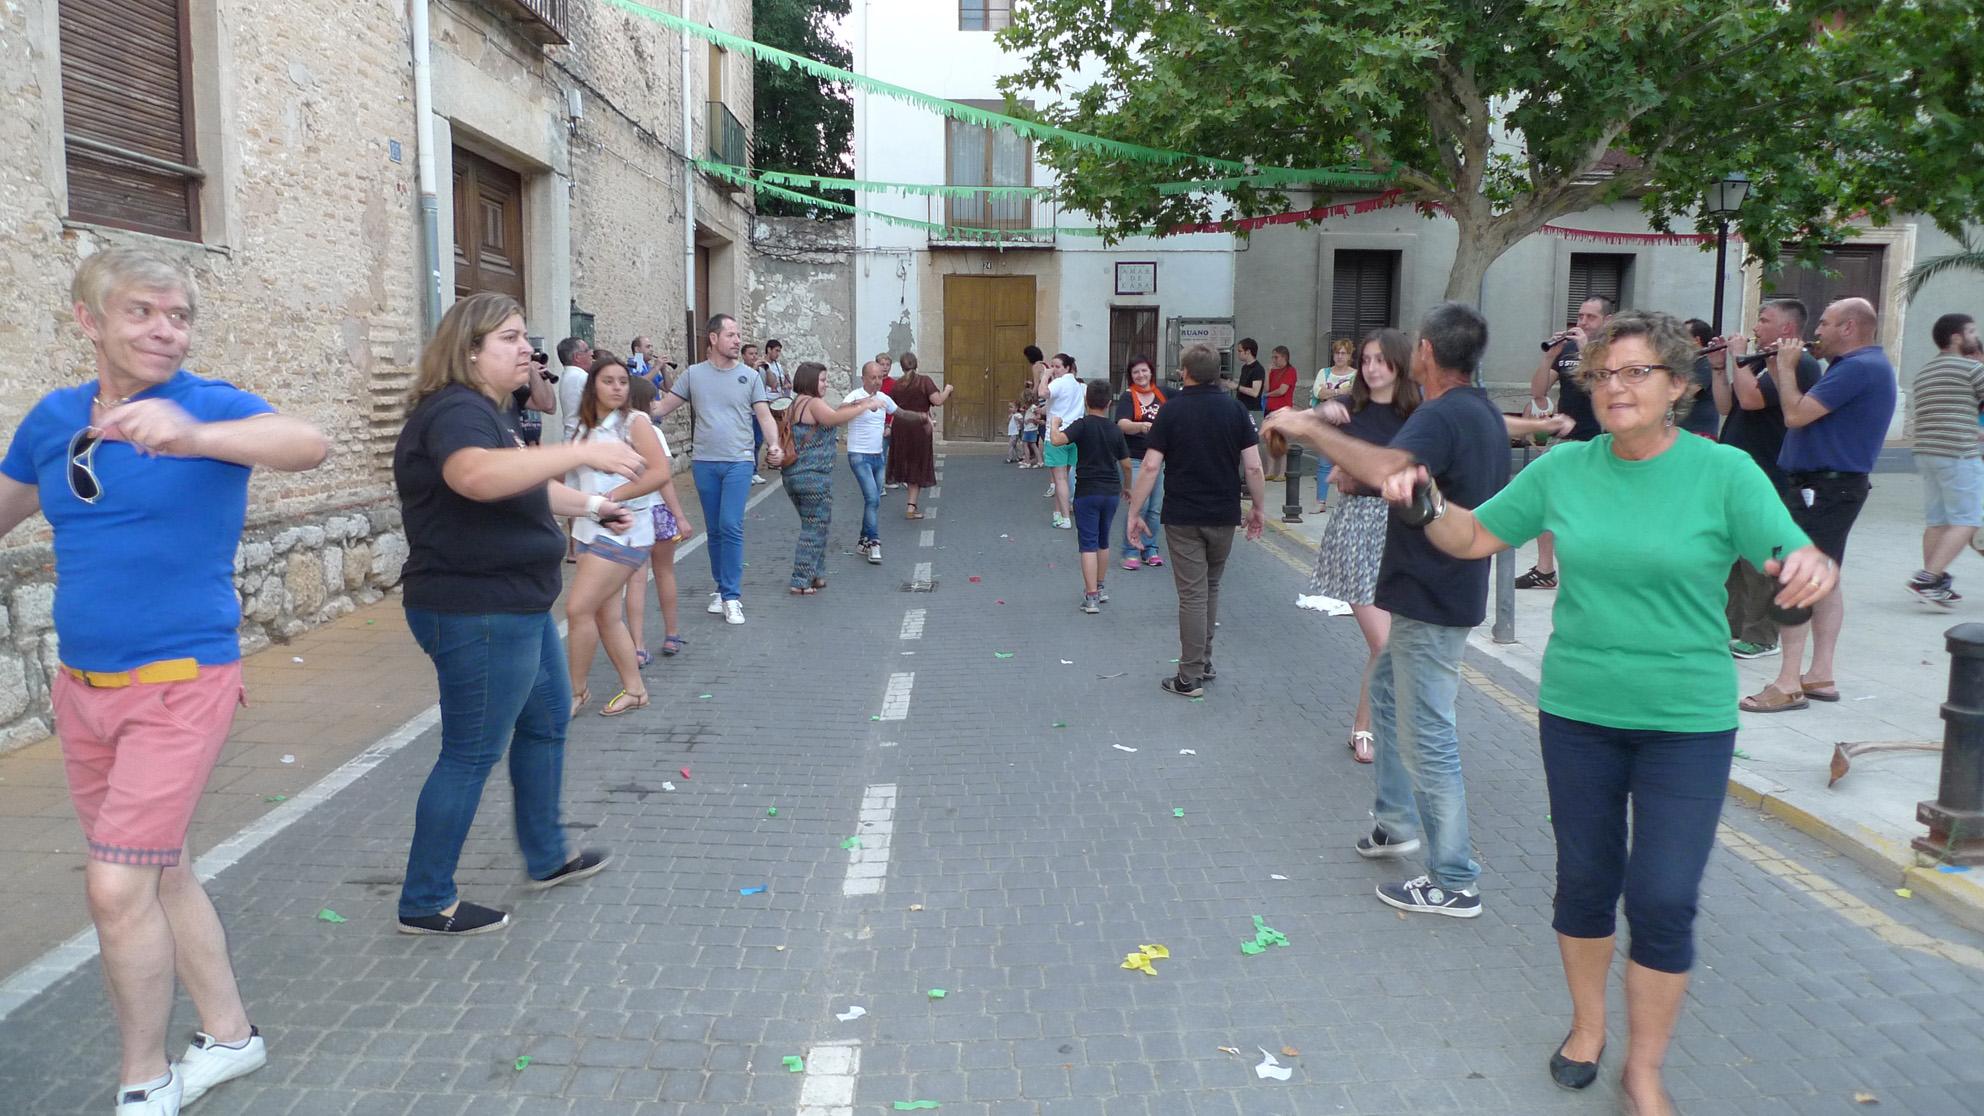 2014-07-20 PalacioDansetesPalacio i Albaes (1)